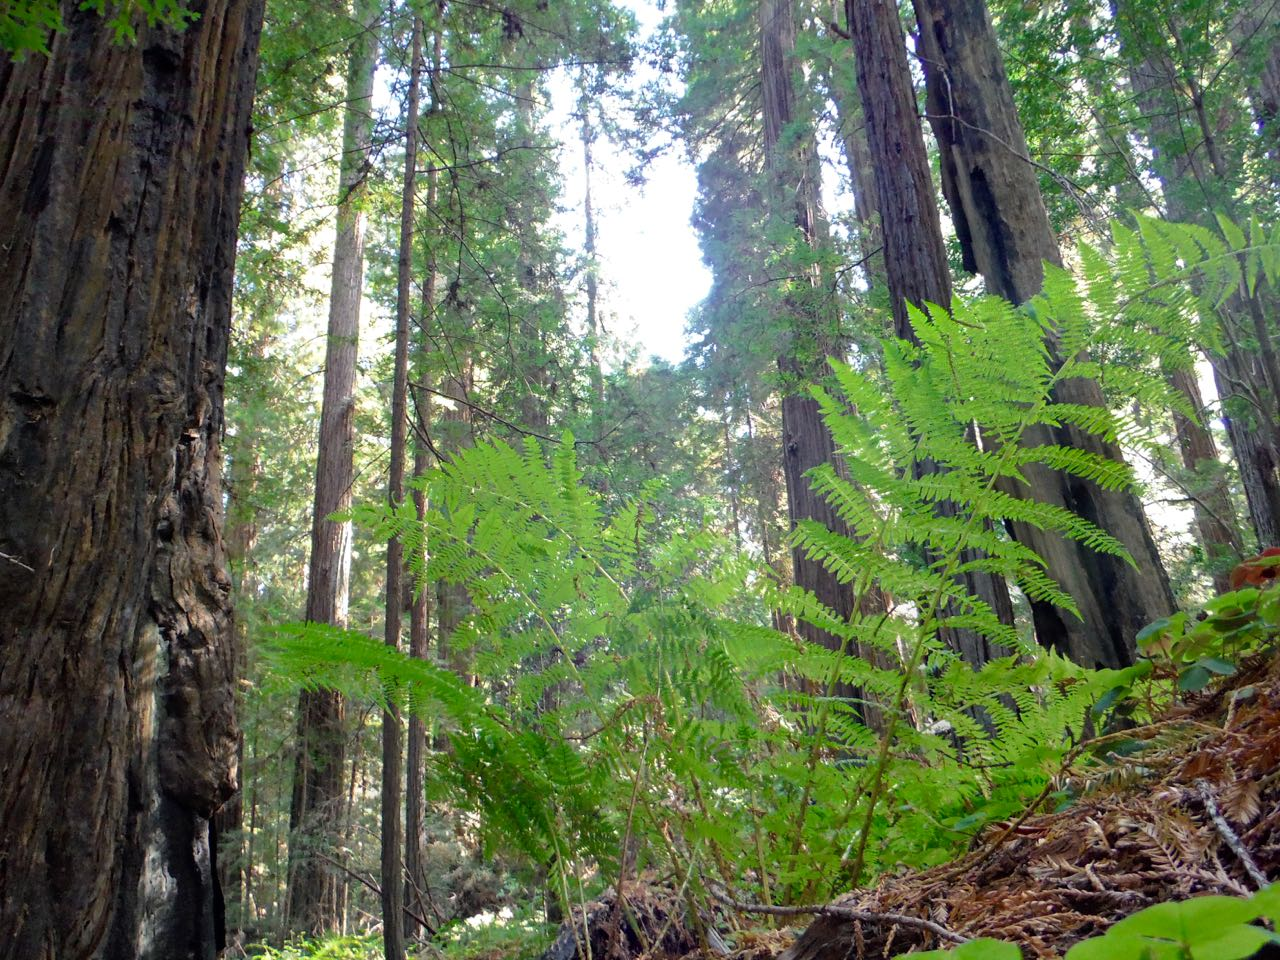 Redwoods 2017 10 08 52 Of 287